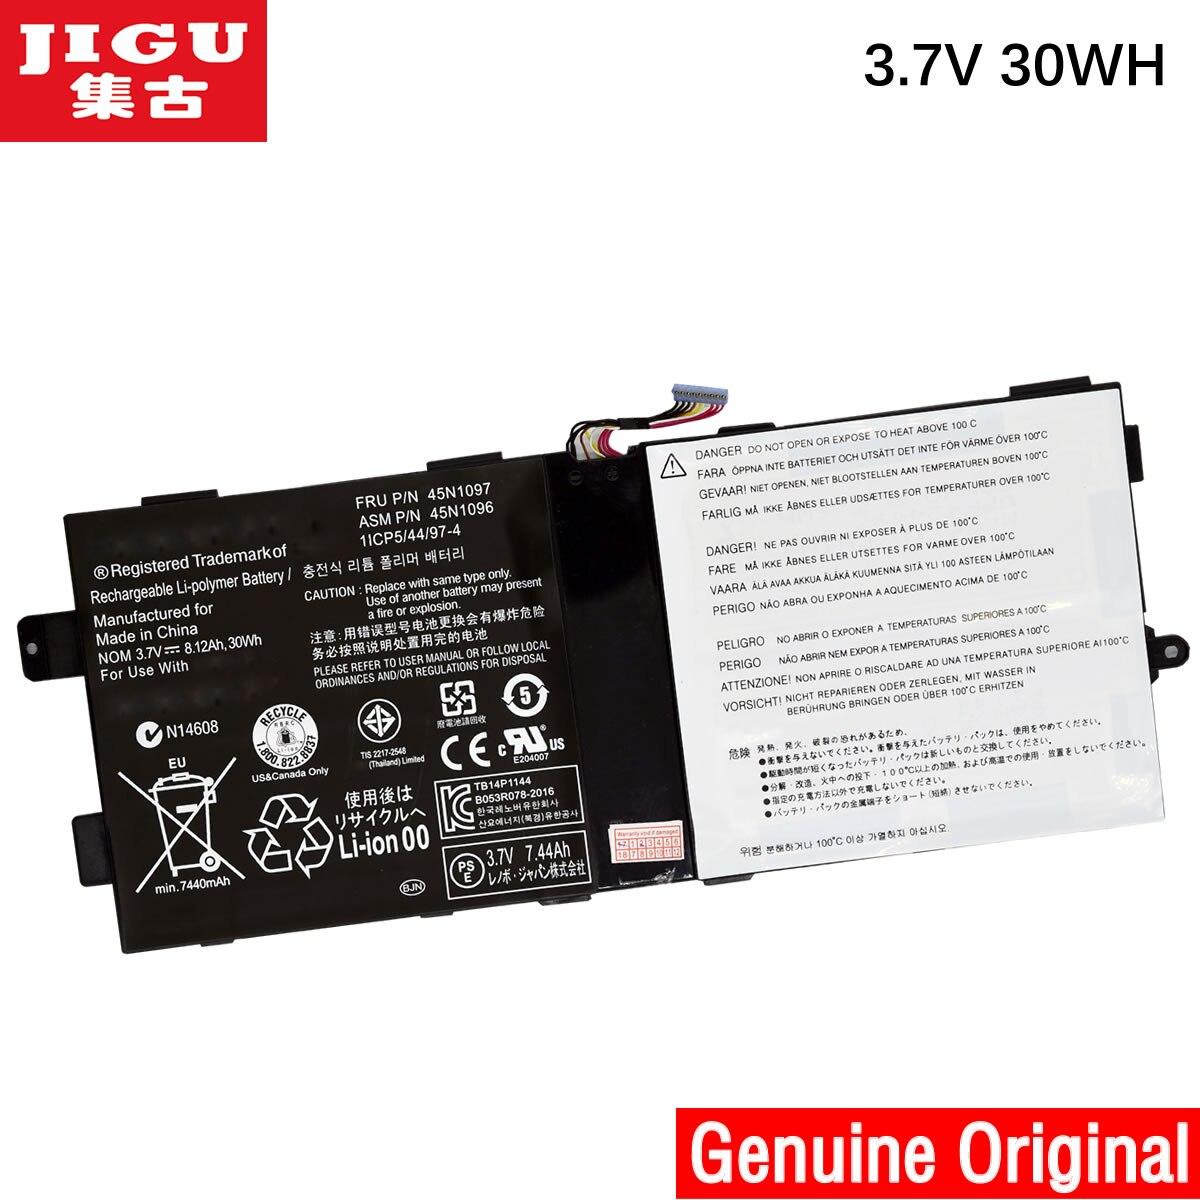 JIGU original new 45N1096 battery for lenovo thinkpad tablet 2 X220T 45N1096 batteria batteries AKKU 3.7V 30WH